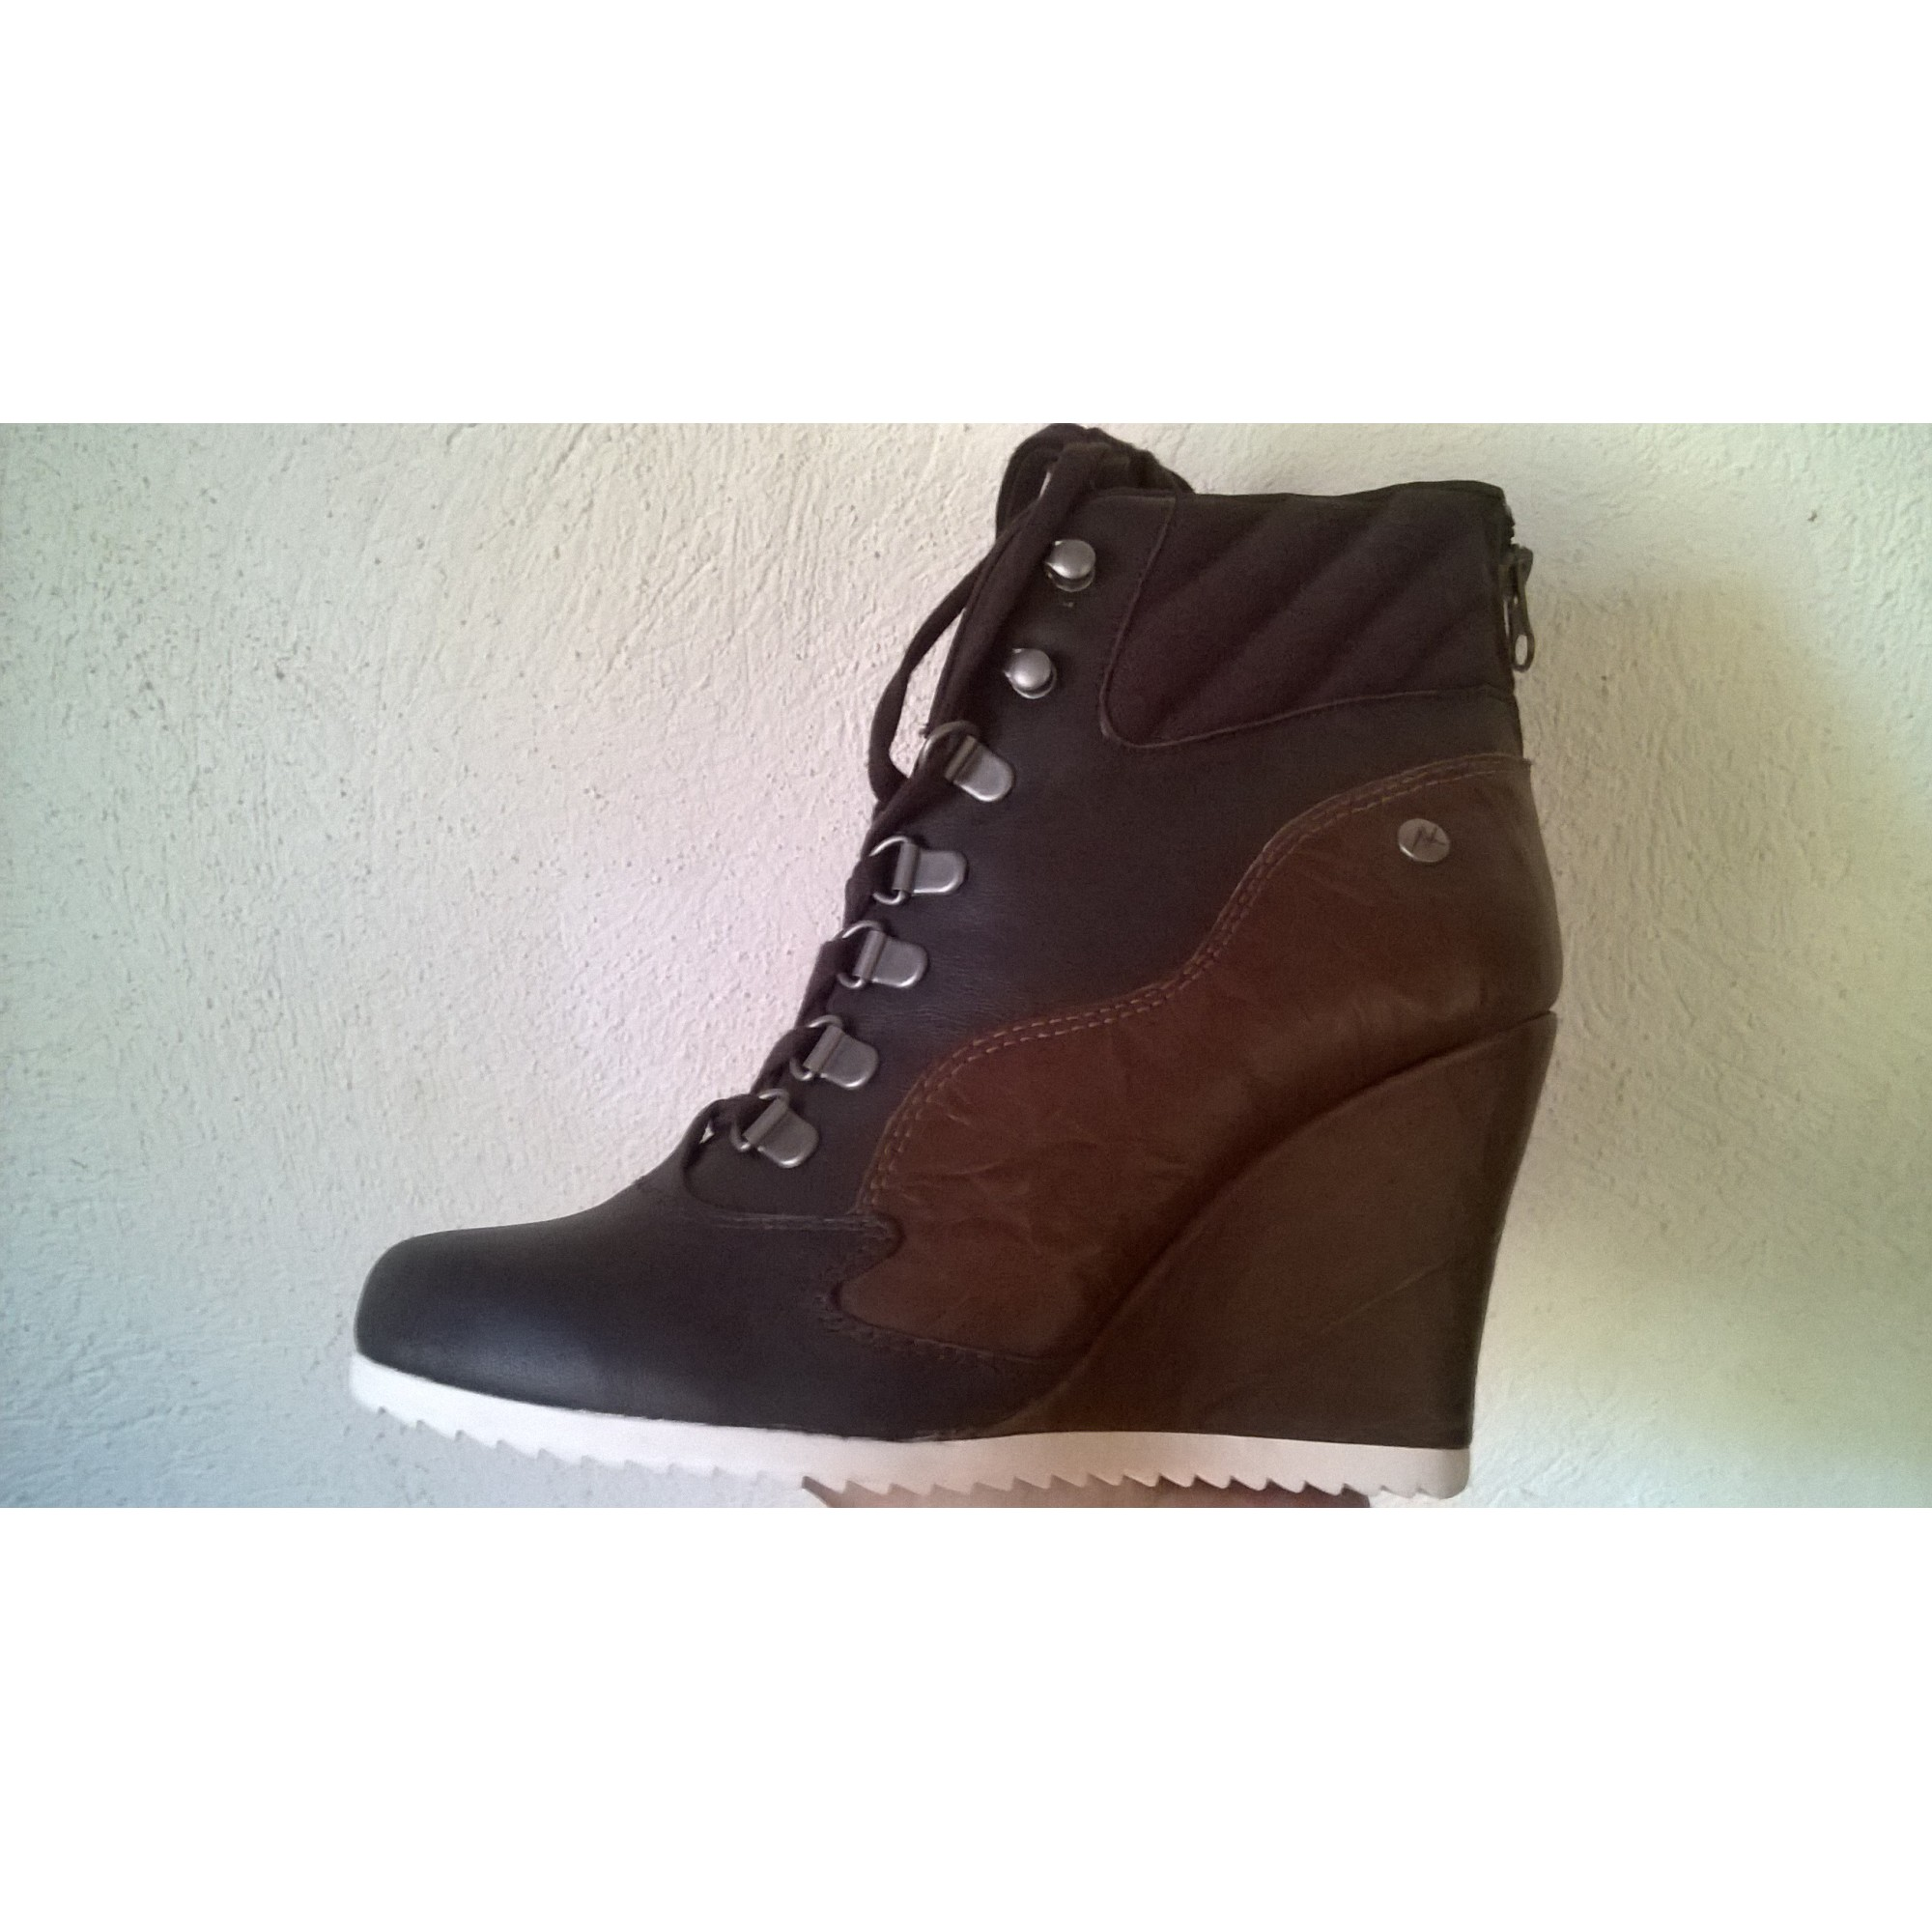 Compensés Vendu Par Vanessa8 Boots 37 Low À Bottinesamp; Marron Reebok F1J3uTclK